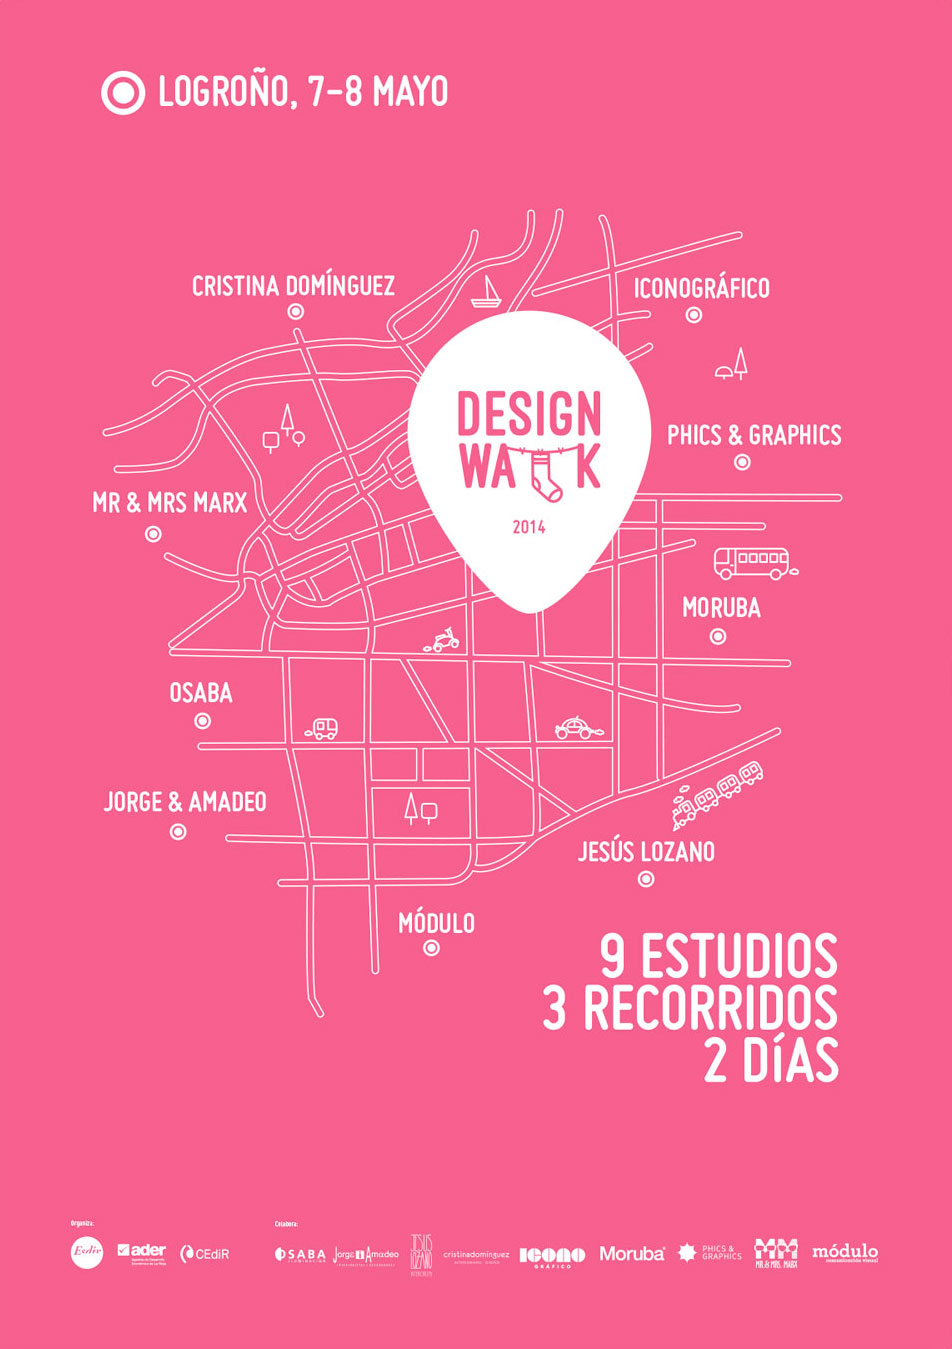 DESIGN WALK 2014